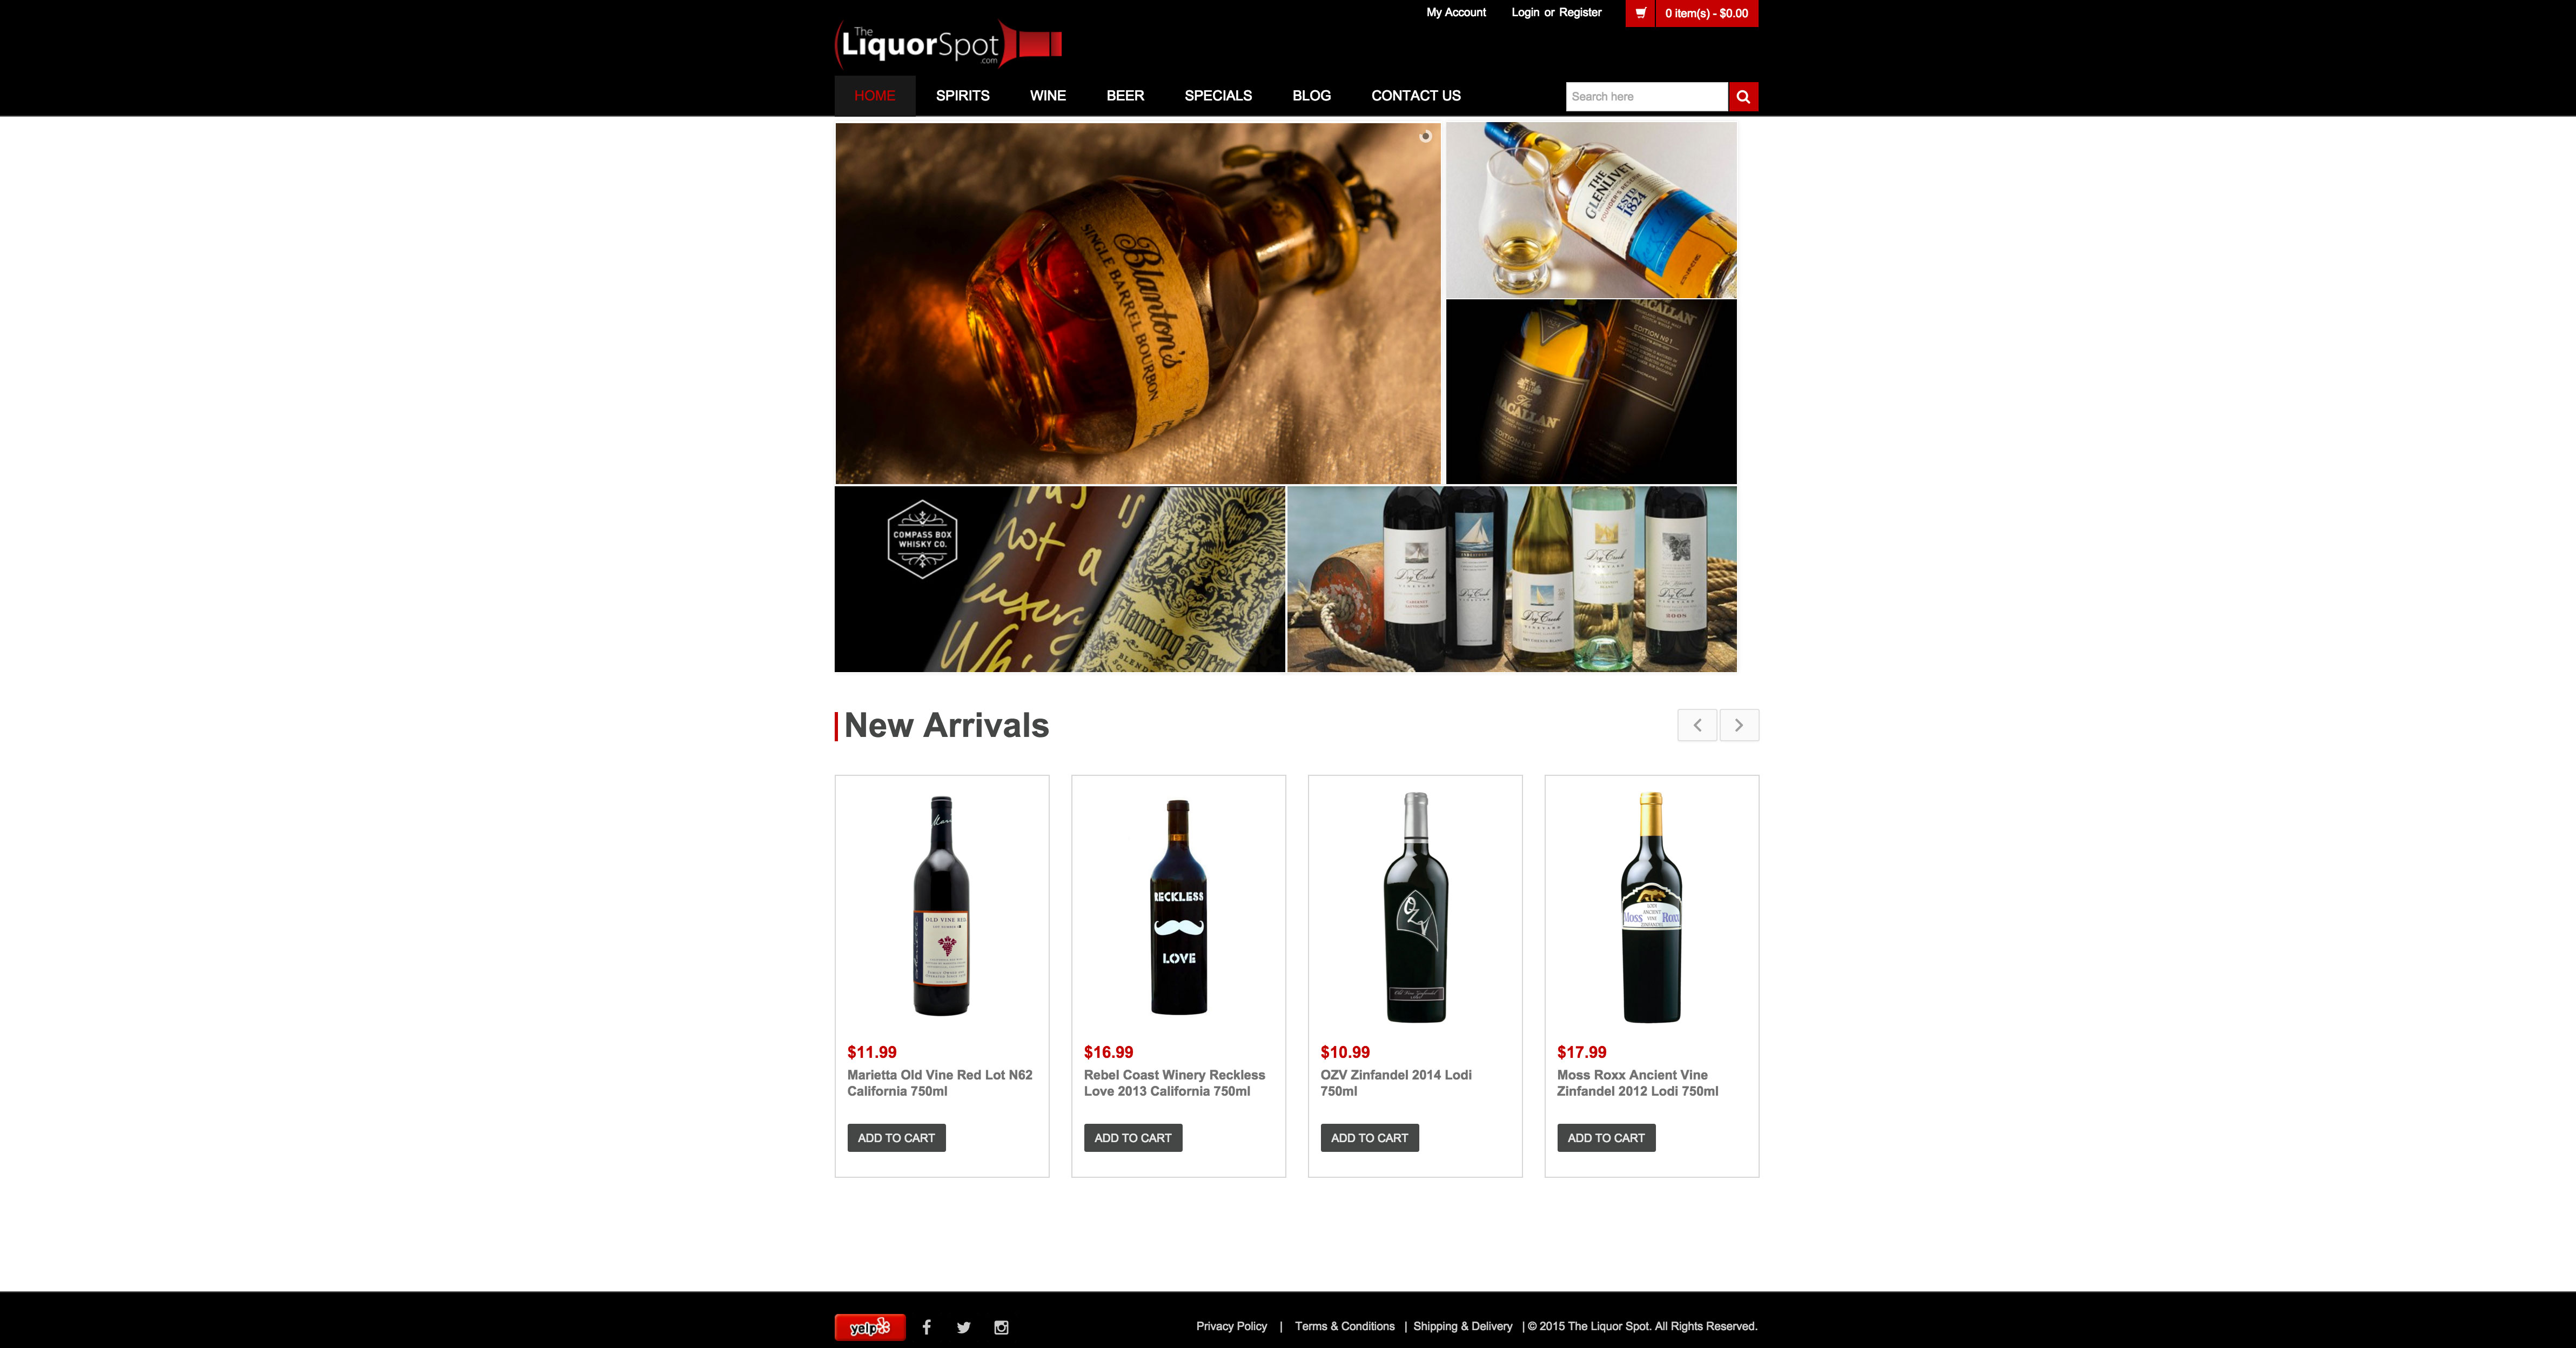 Liquor Store Website Design and SEO in Los Angeles